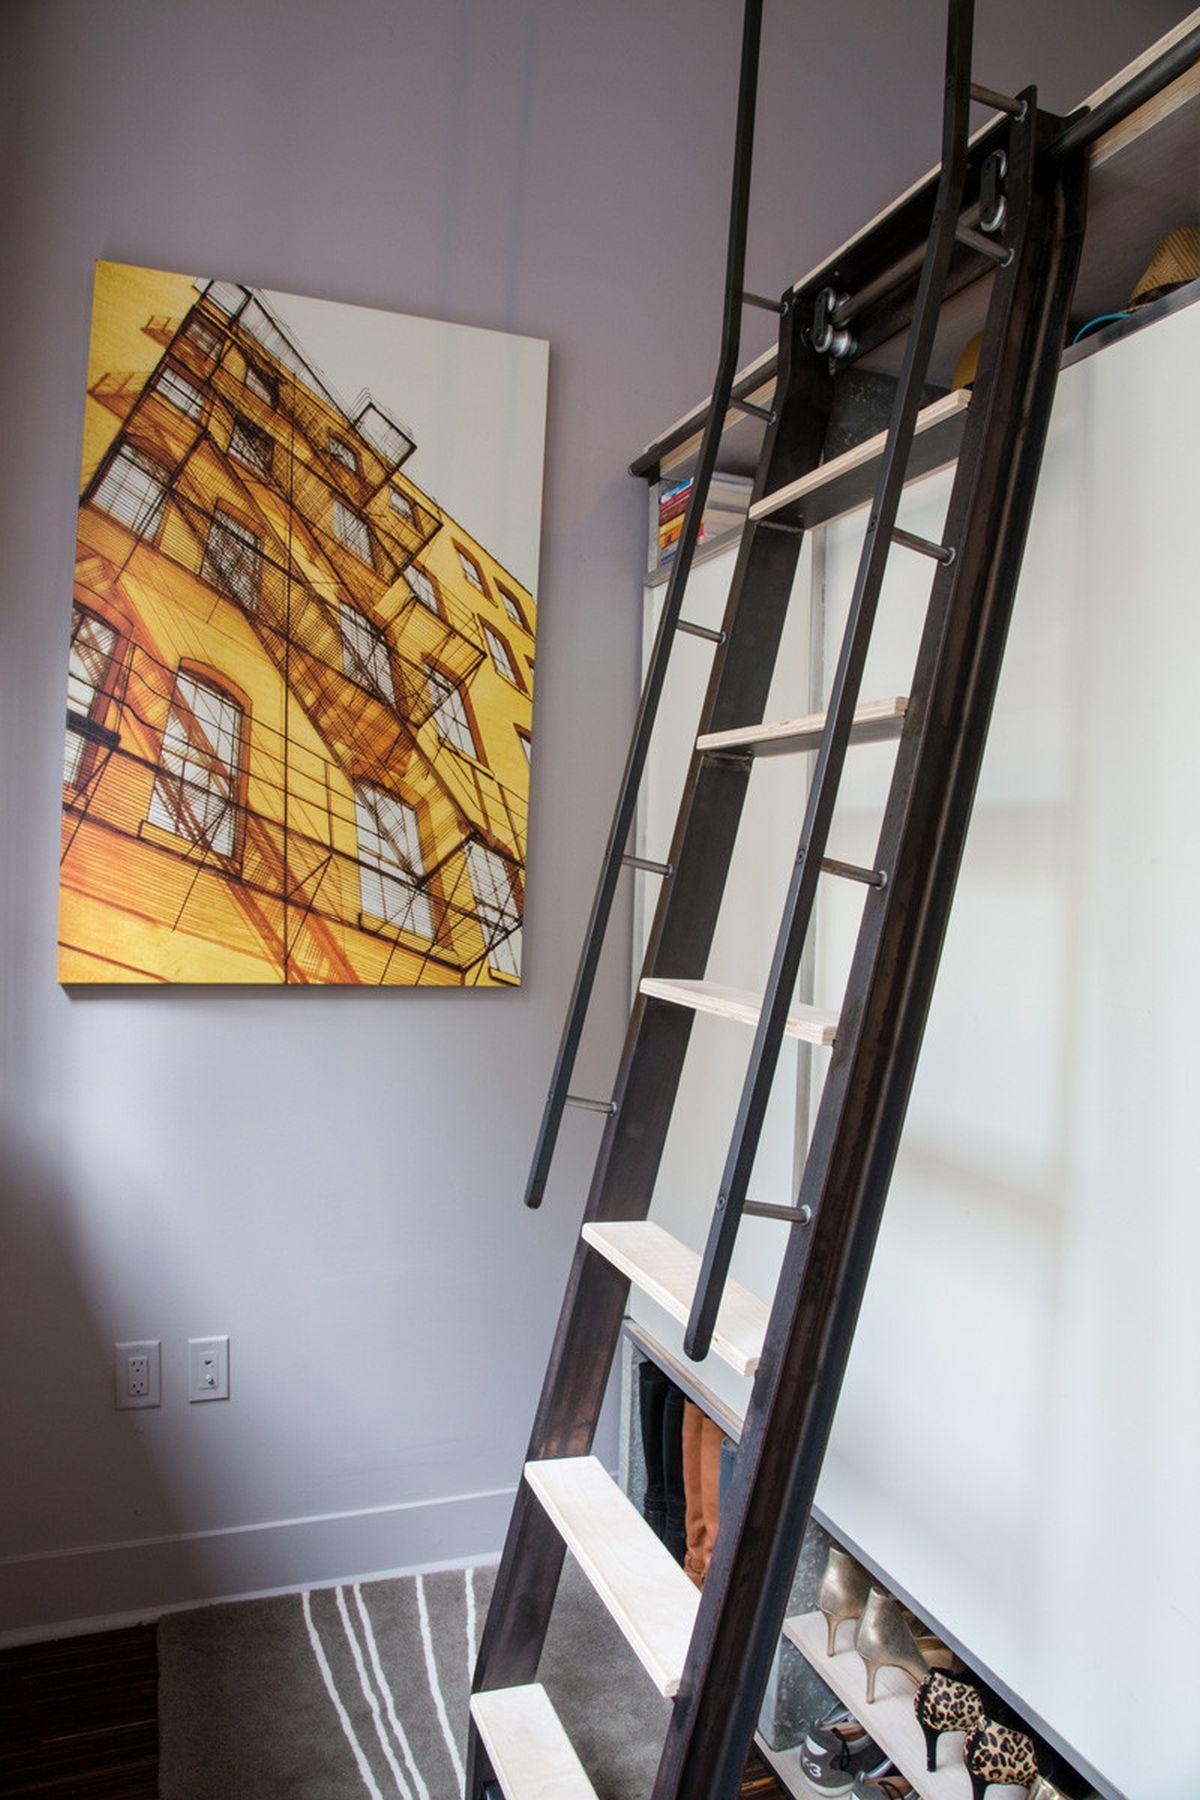 The Domino Loft ladder with storage behind